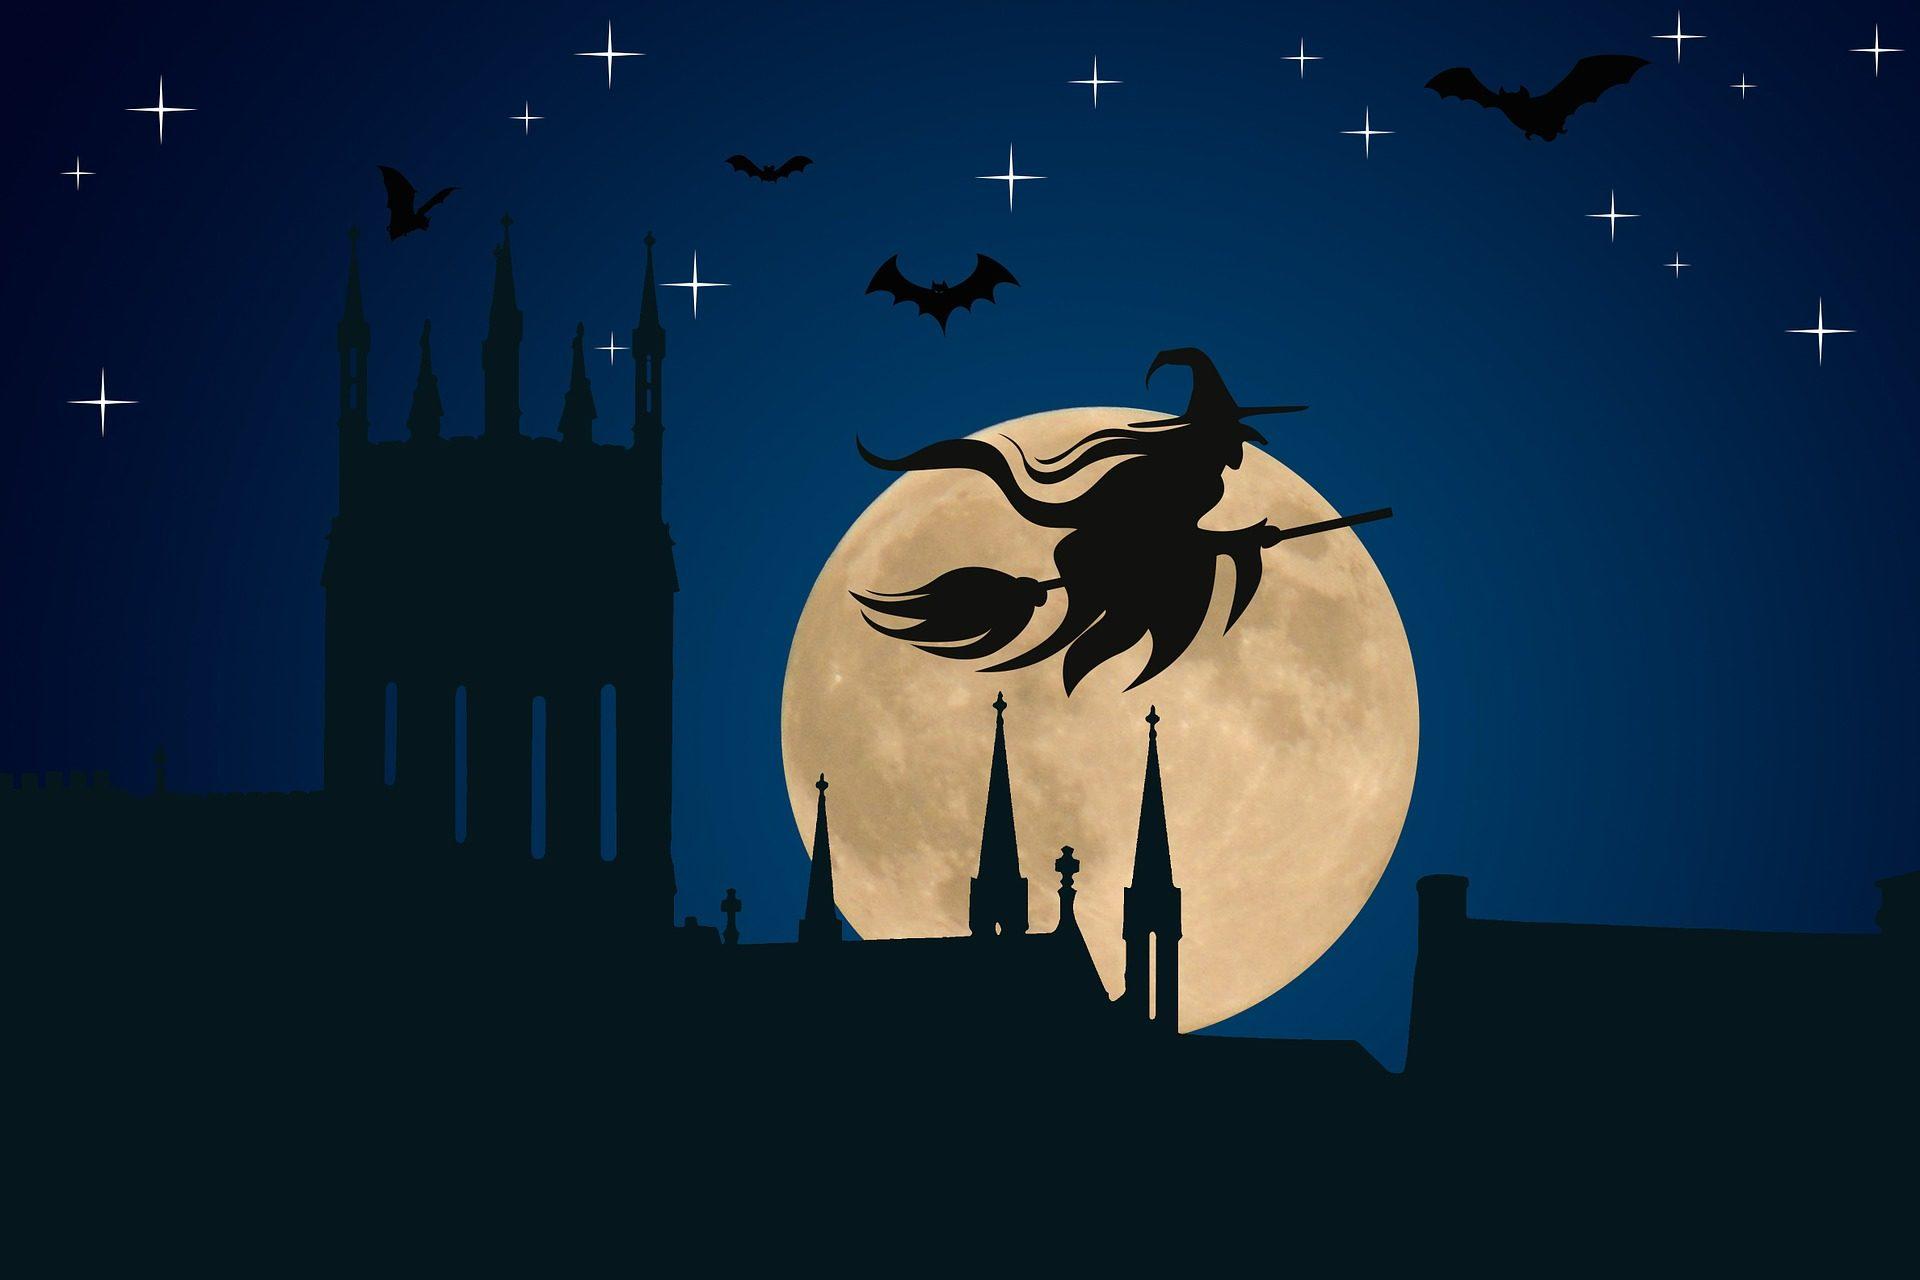 bruja, escoba, murciélagos, luna, noche, susto, halloween - Fondos de Pantalla HD - professor-falken.com